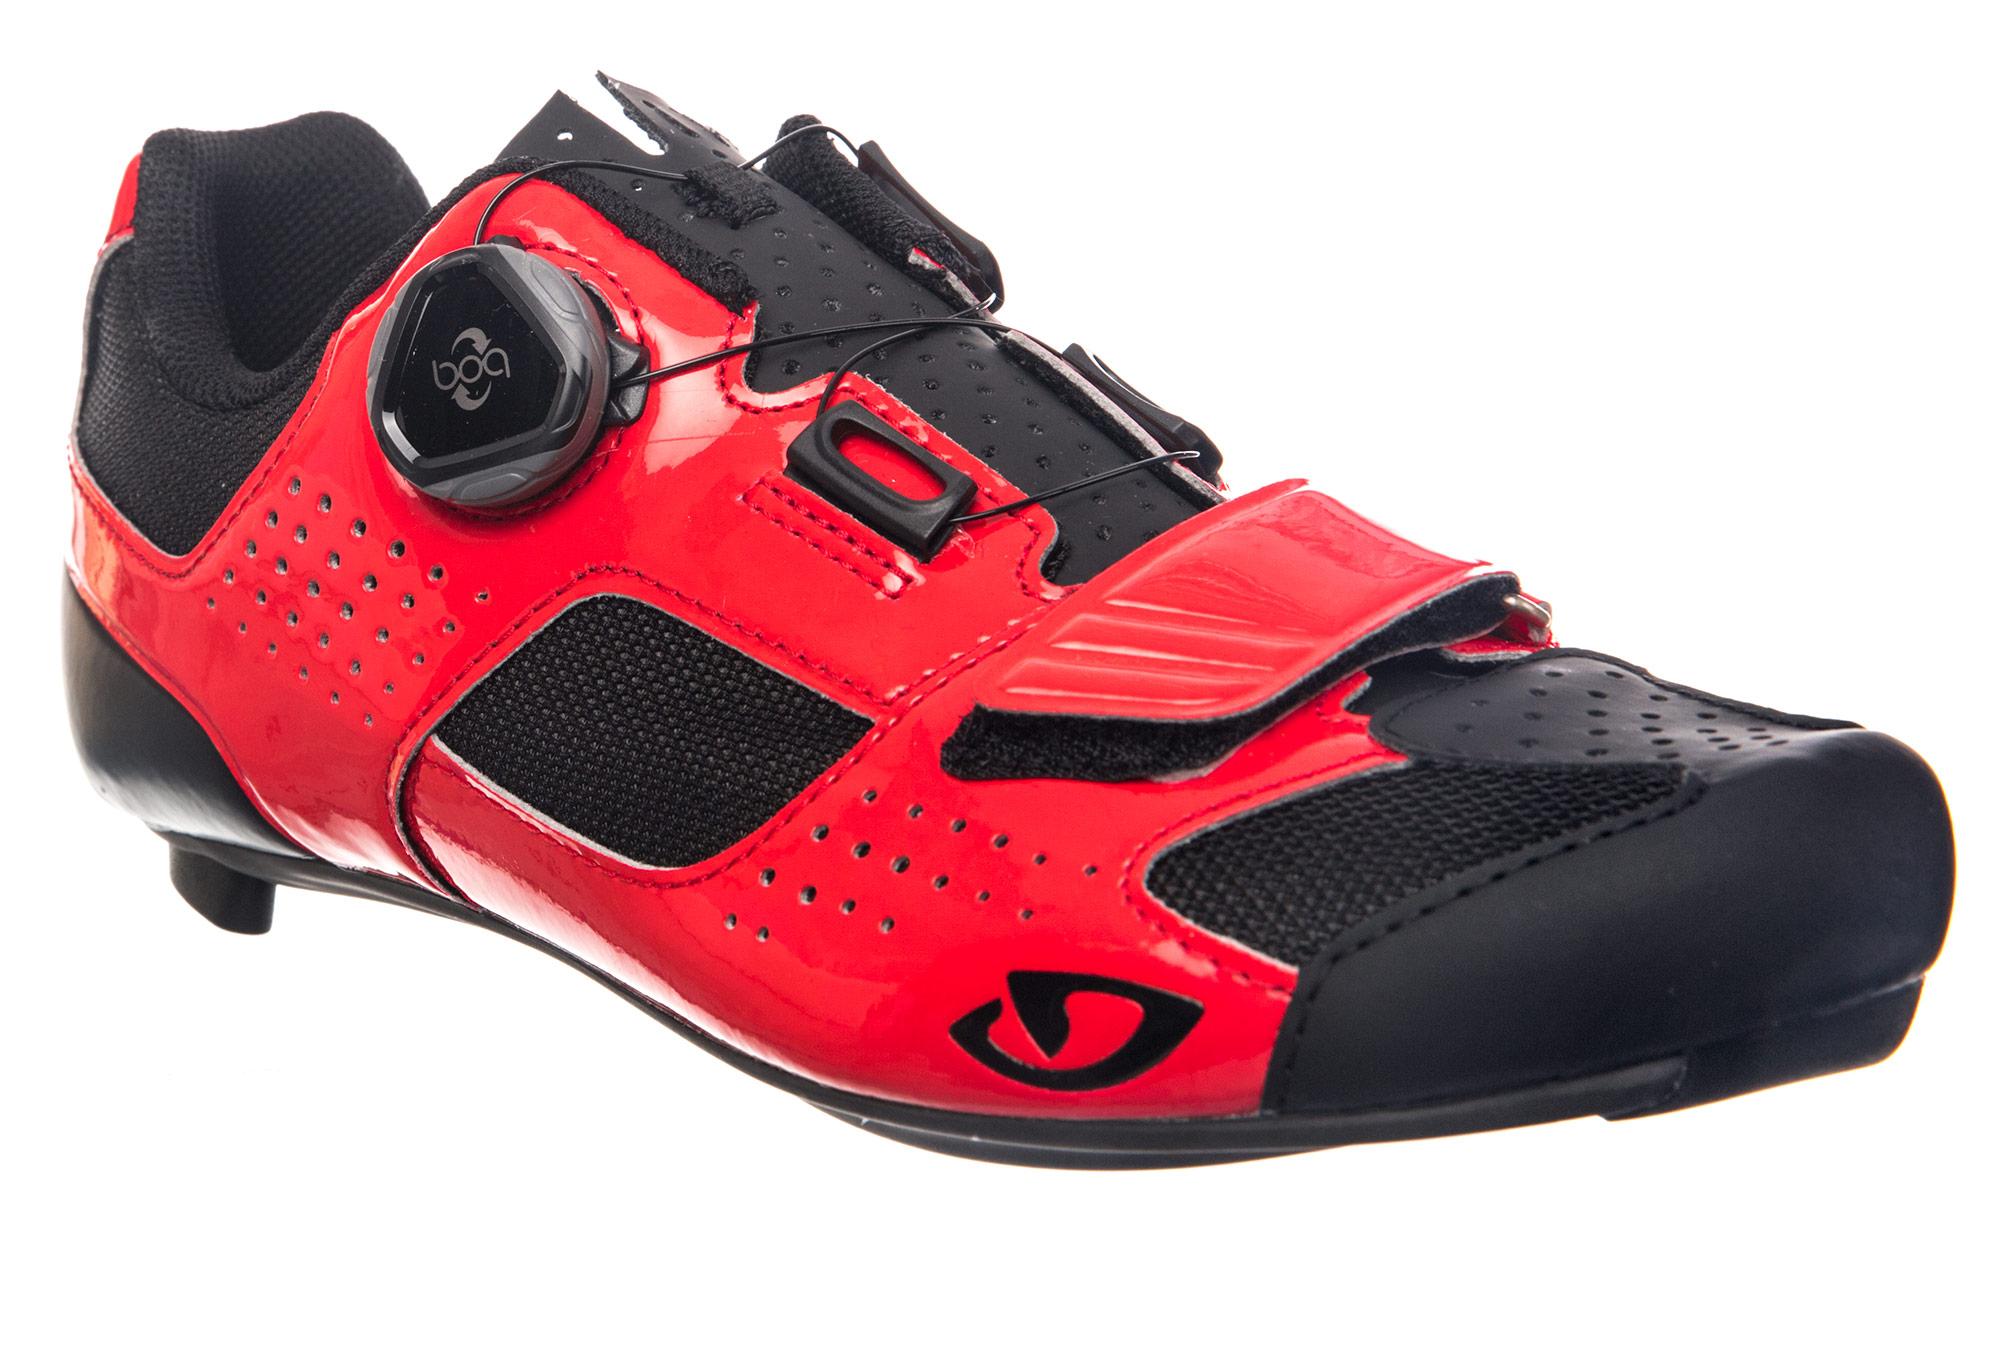 35e9e2494b6 Chaussures Route Giro Trans Boa Rouge Noir